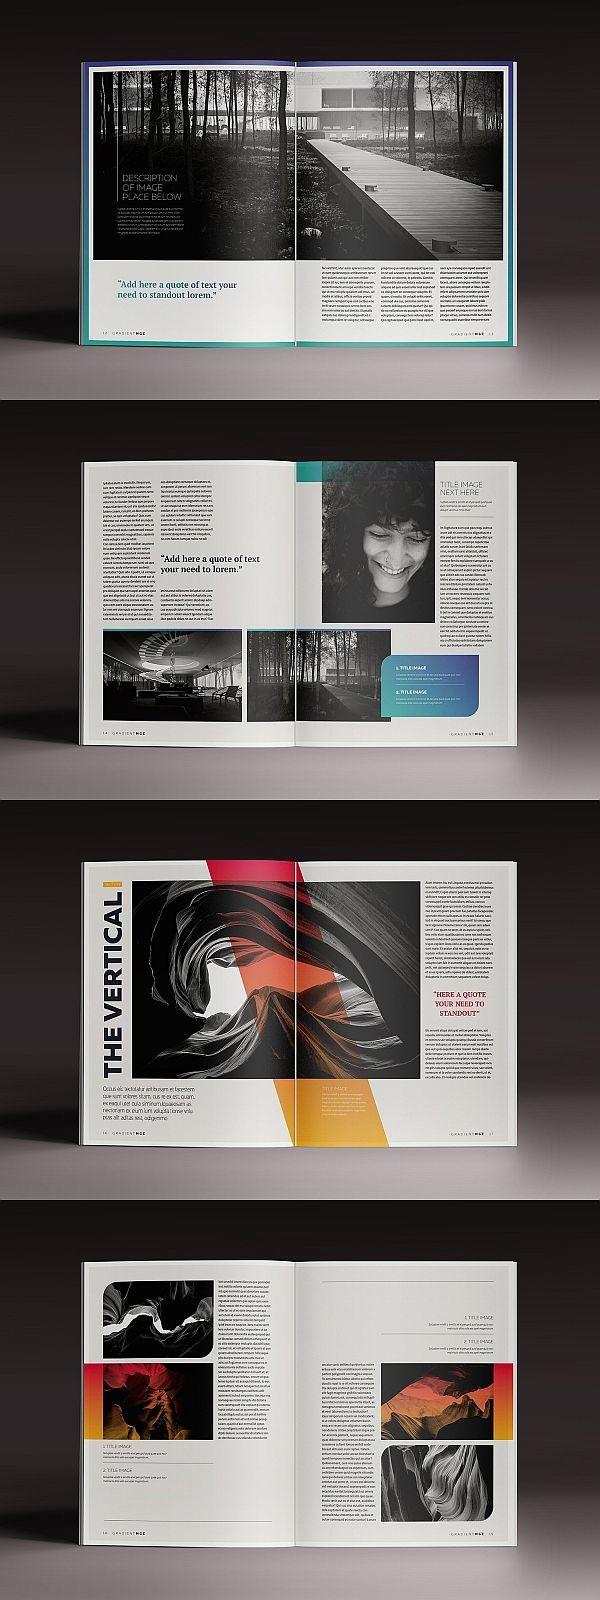 Gradient Magazine Indesign Template In 2020 Indesign Vorlage Template Magazin